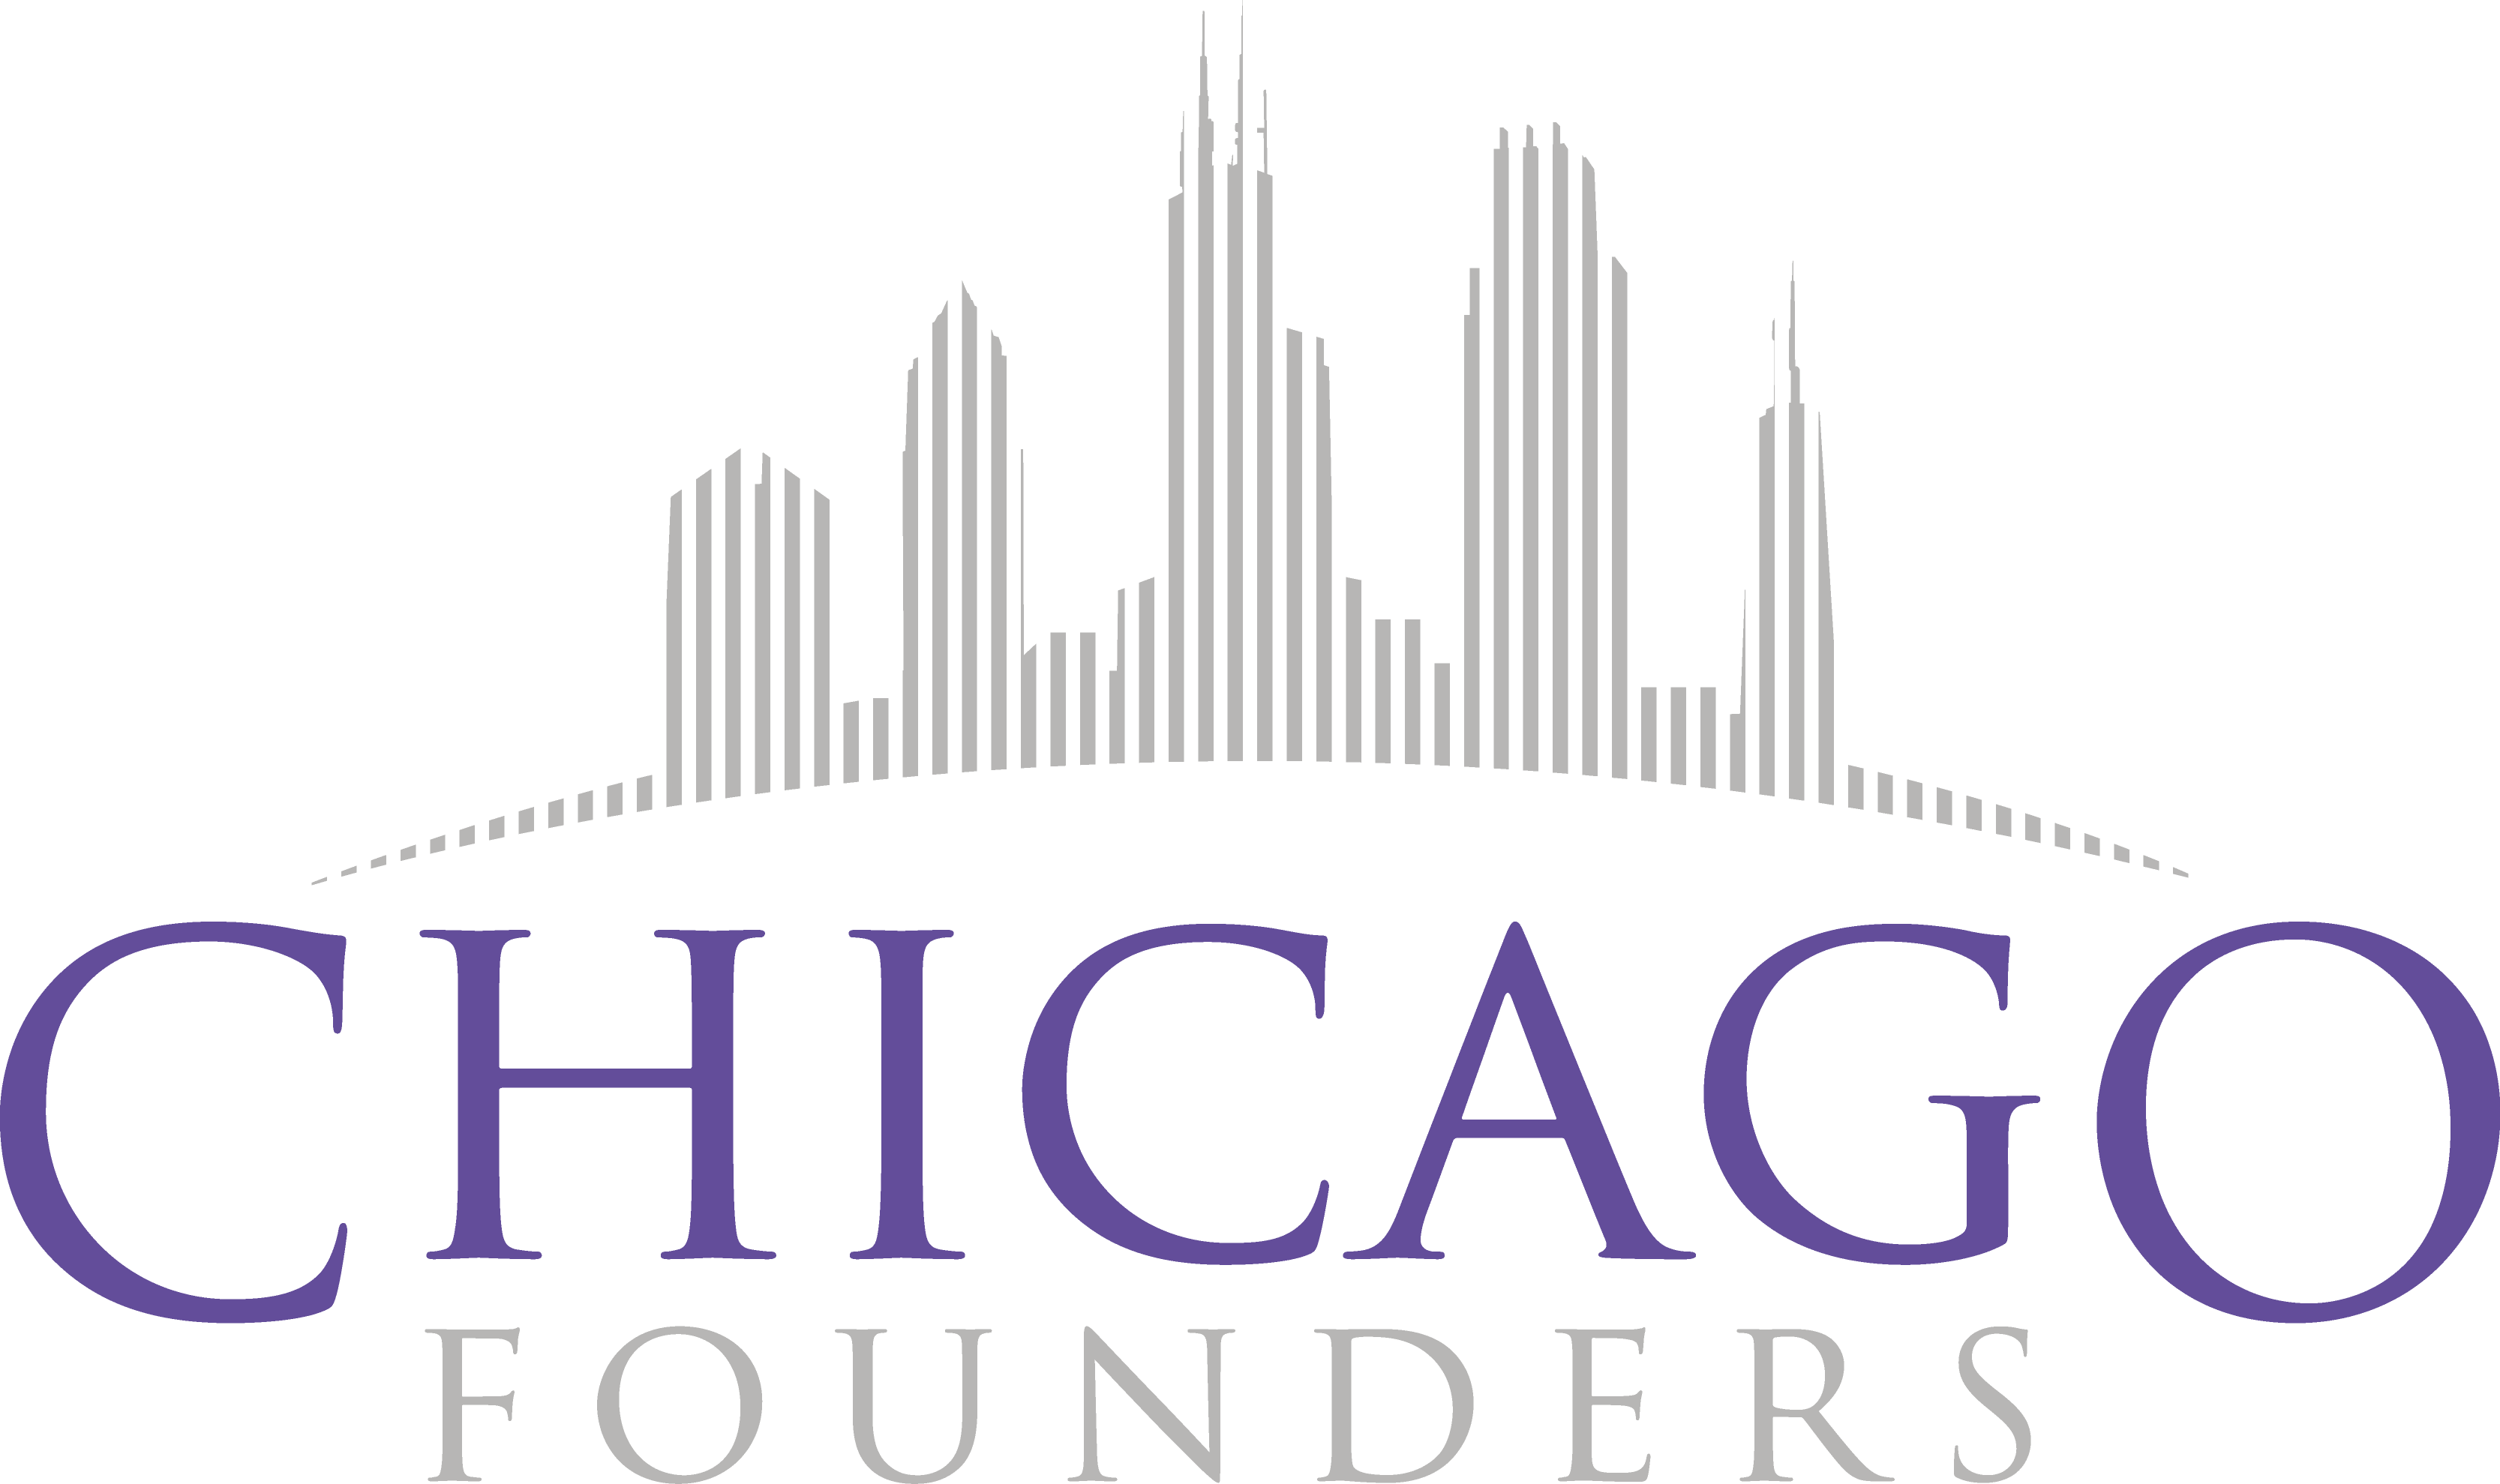 Chicago Founders' Stories @1871: Godard Abel of G2.com, Inc.